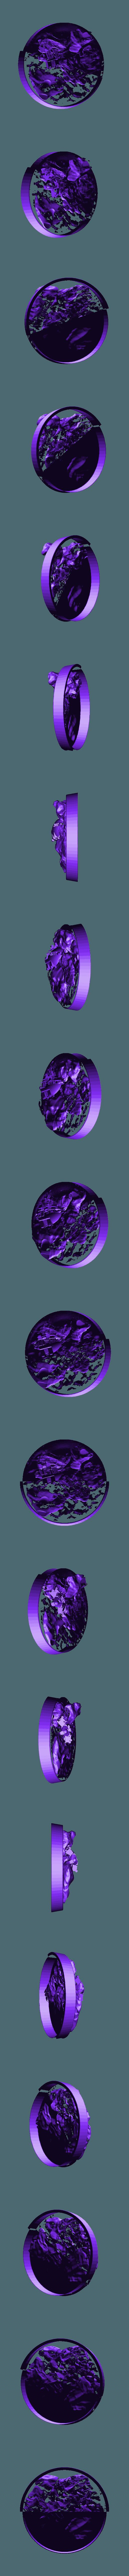 Ranger_3.1_-_Base.stl Download free STL file Martian Mechanized Rangers • 3D printable object, ErikTheHeretek